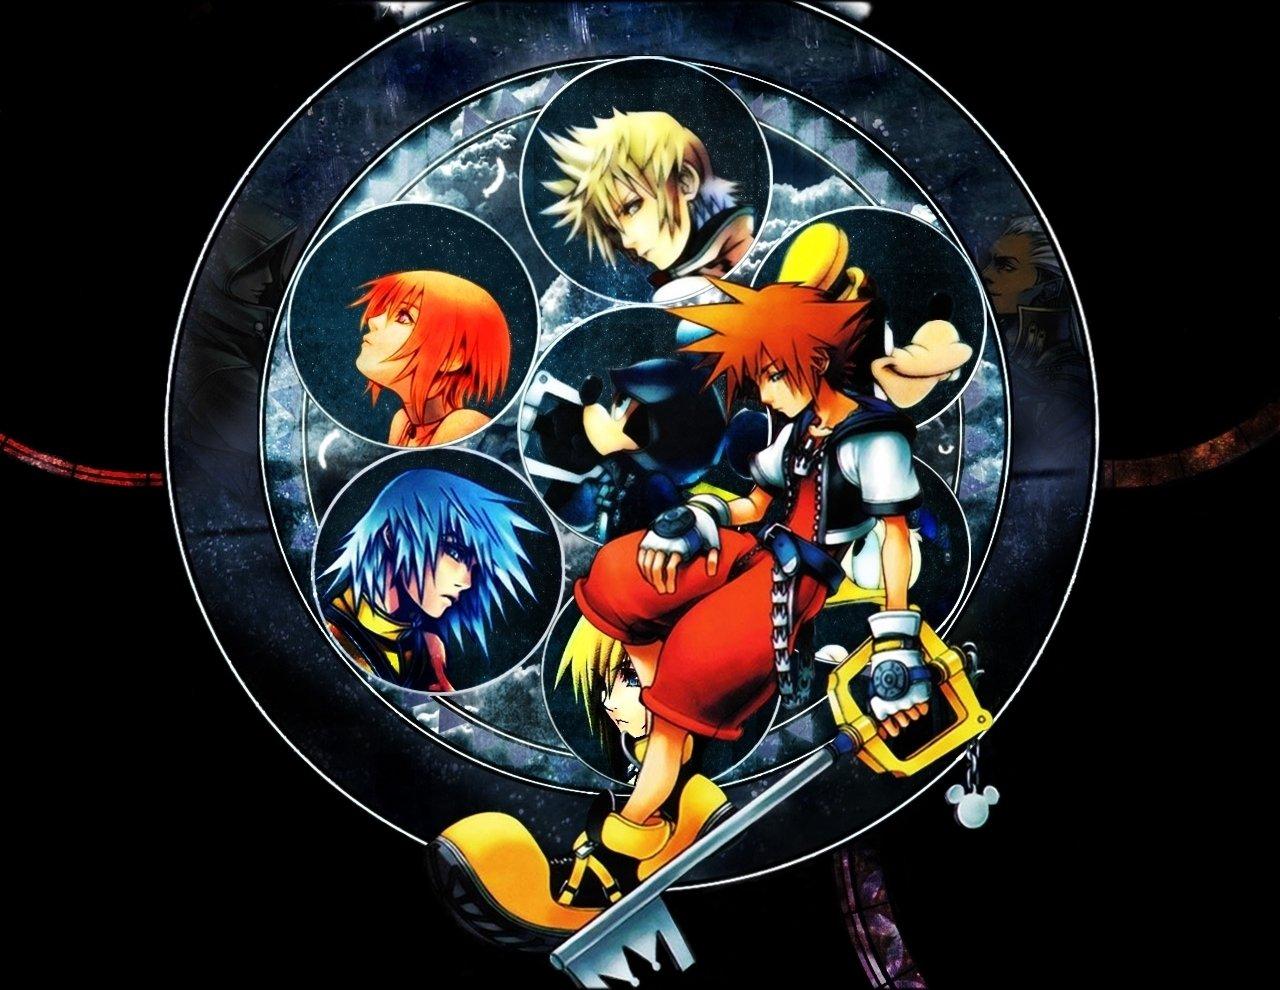 Hd Wallpaper - Kingdom Hearts Sora Heart , HD Wallpaper & Backgrounds